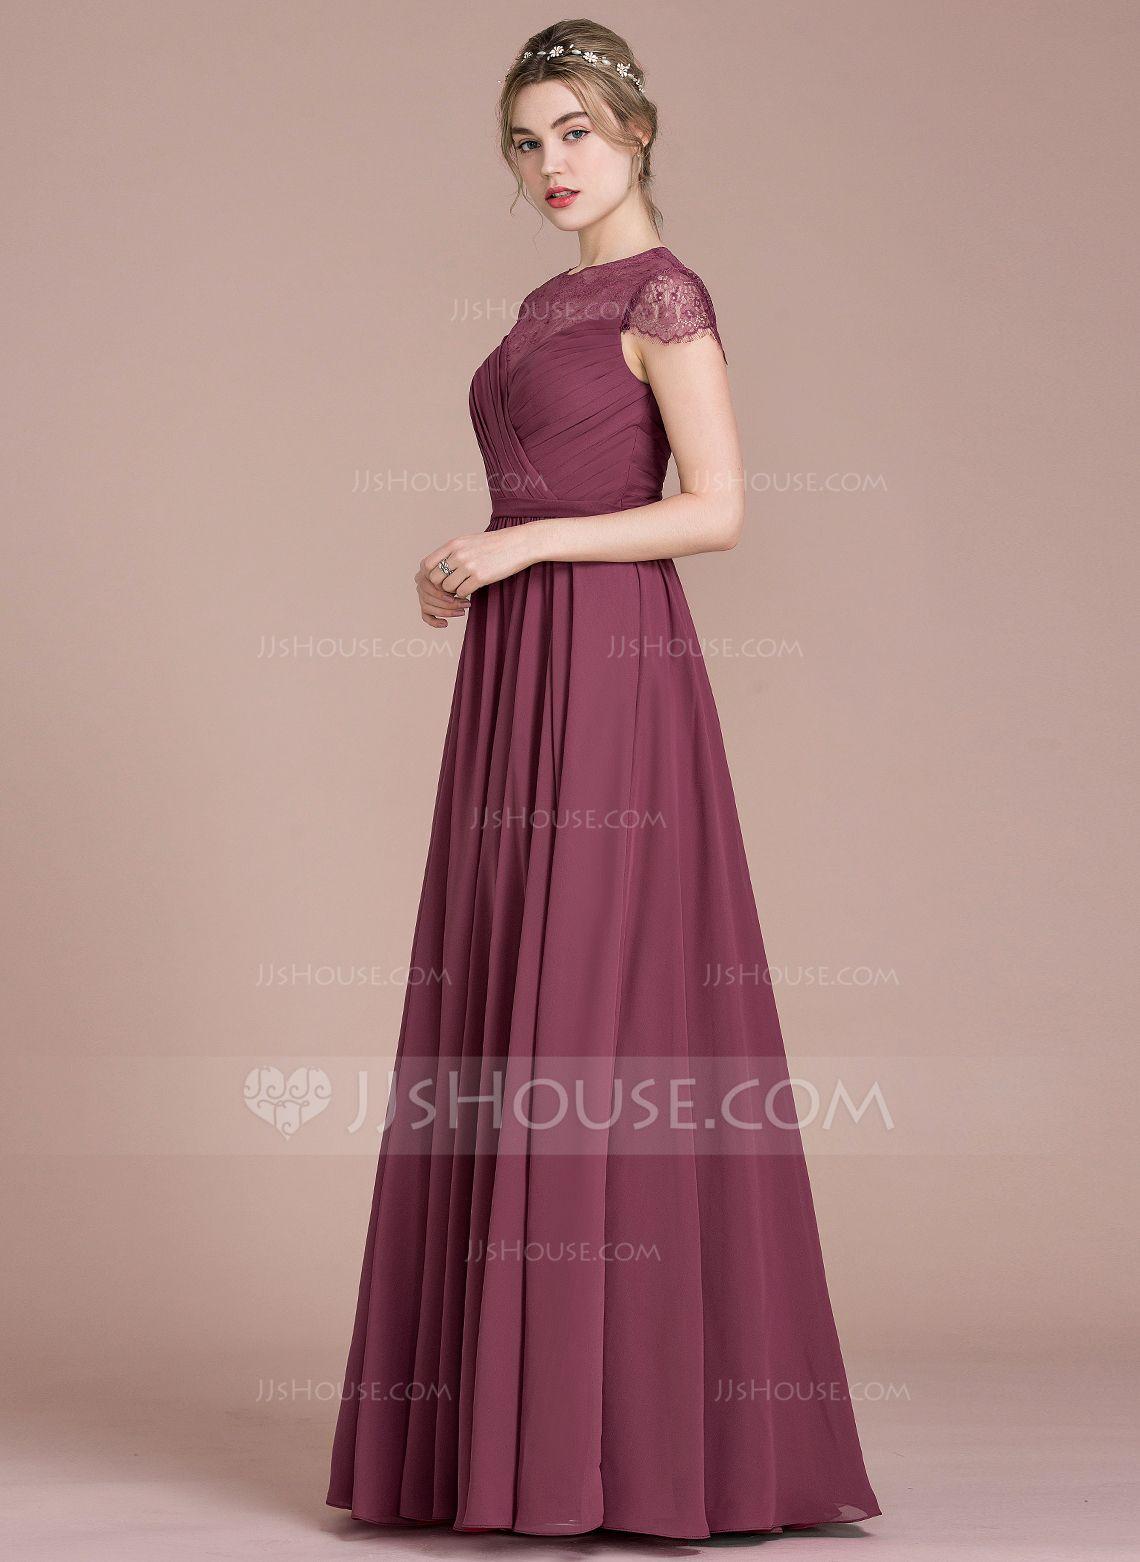 330dda5ced30d5 A-Line/Princess Scoop Neck Floor-Length Chiffon Lace Bridesmaid Dress With  Ruffle (007104723) - Bridesmaid Dresses - JJsHouse